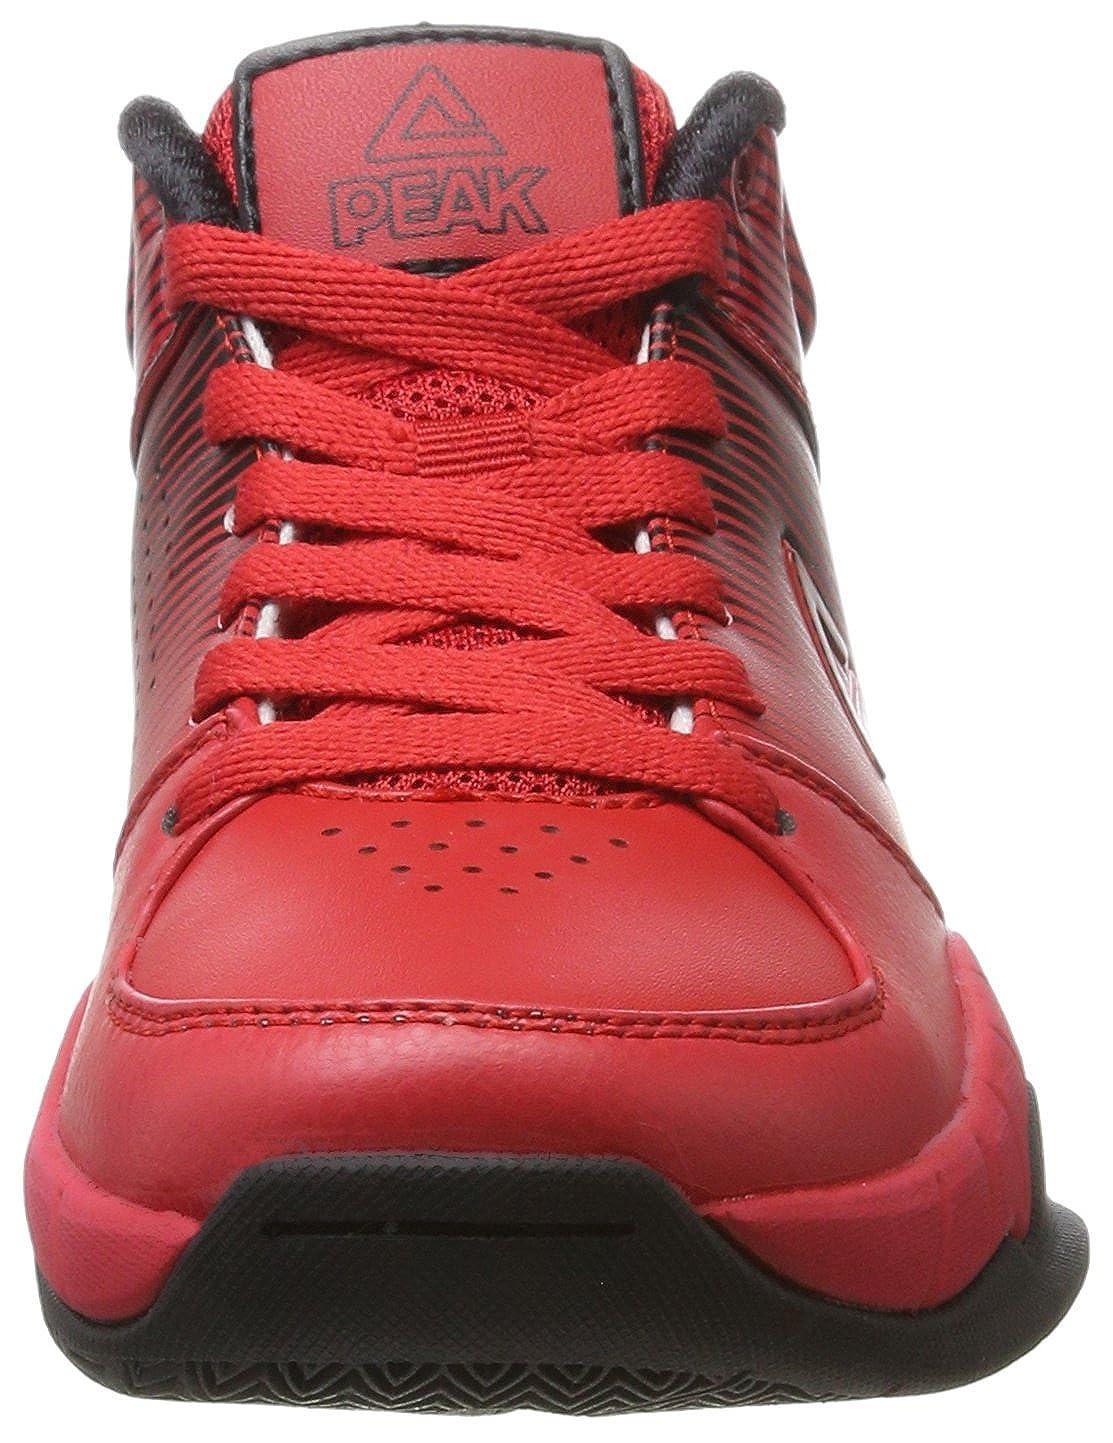 Peak Sport Europe Basketballshoe Kids Weave Zapatillas de Baloncesto Unisex para Ni/ños